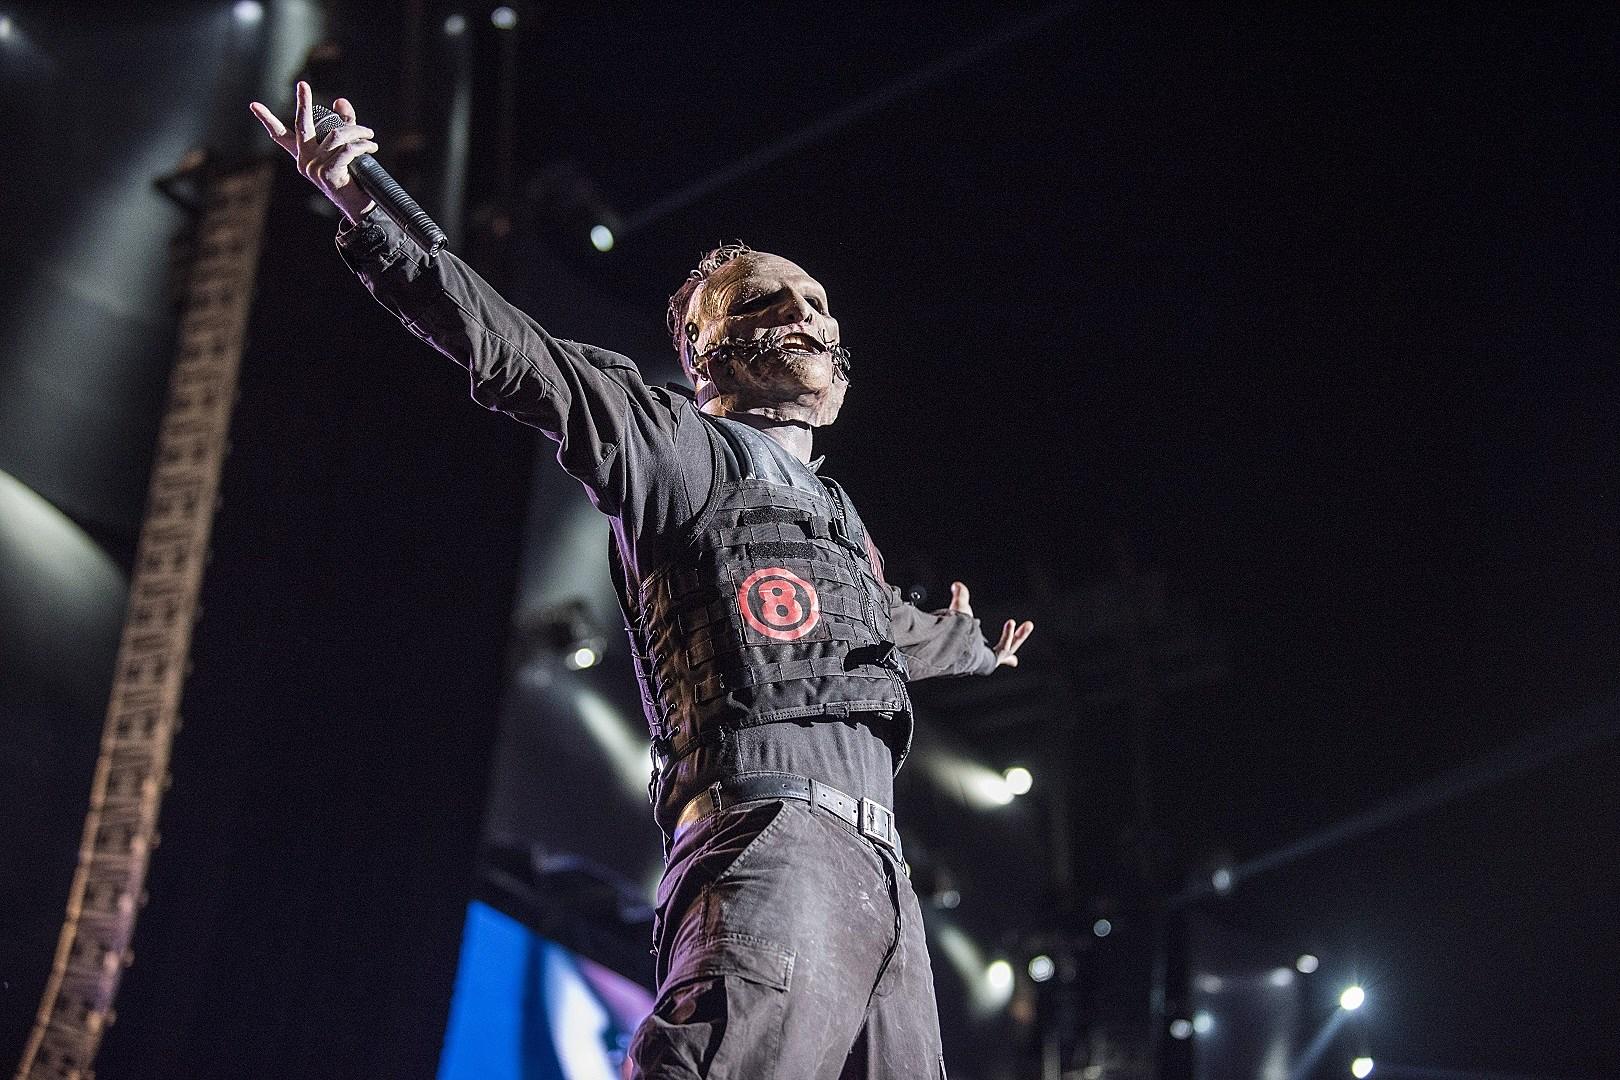 Slipknot to Headline 2019 Download Festival, Reveal 2019 European Tour Dates